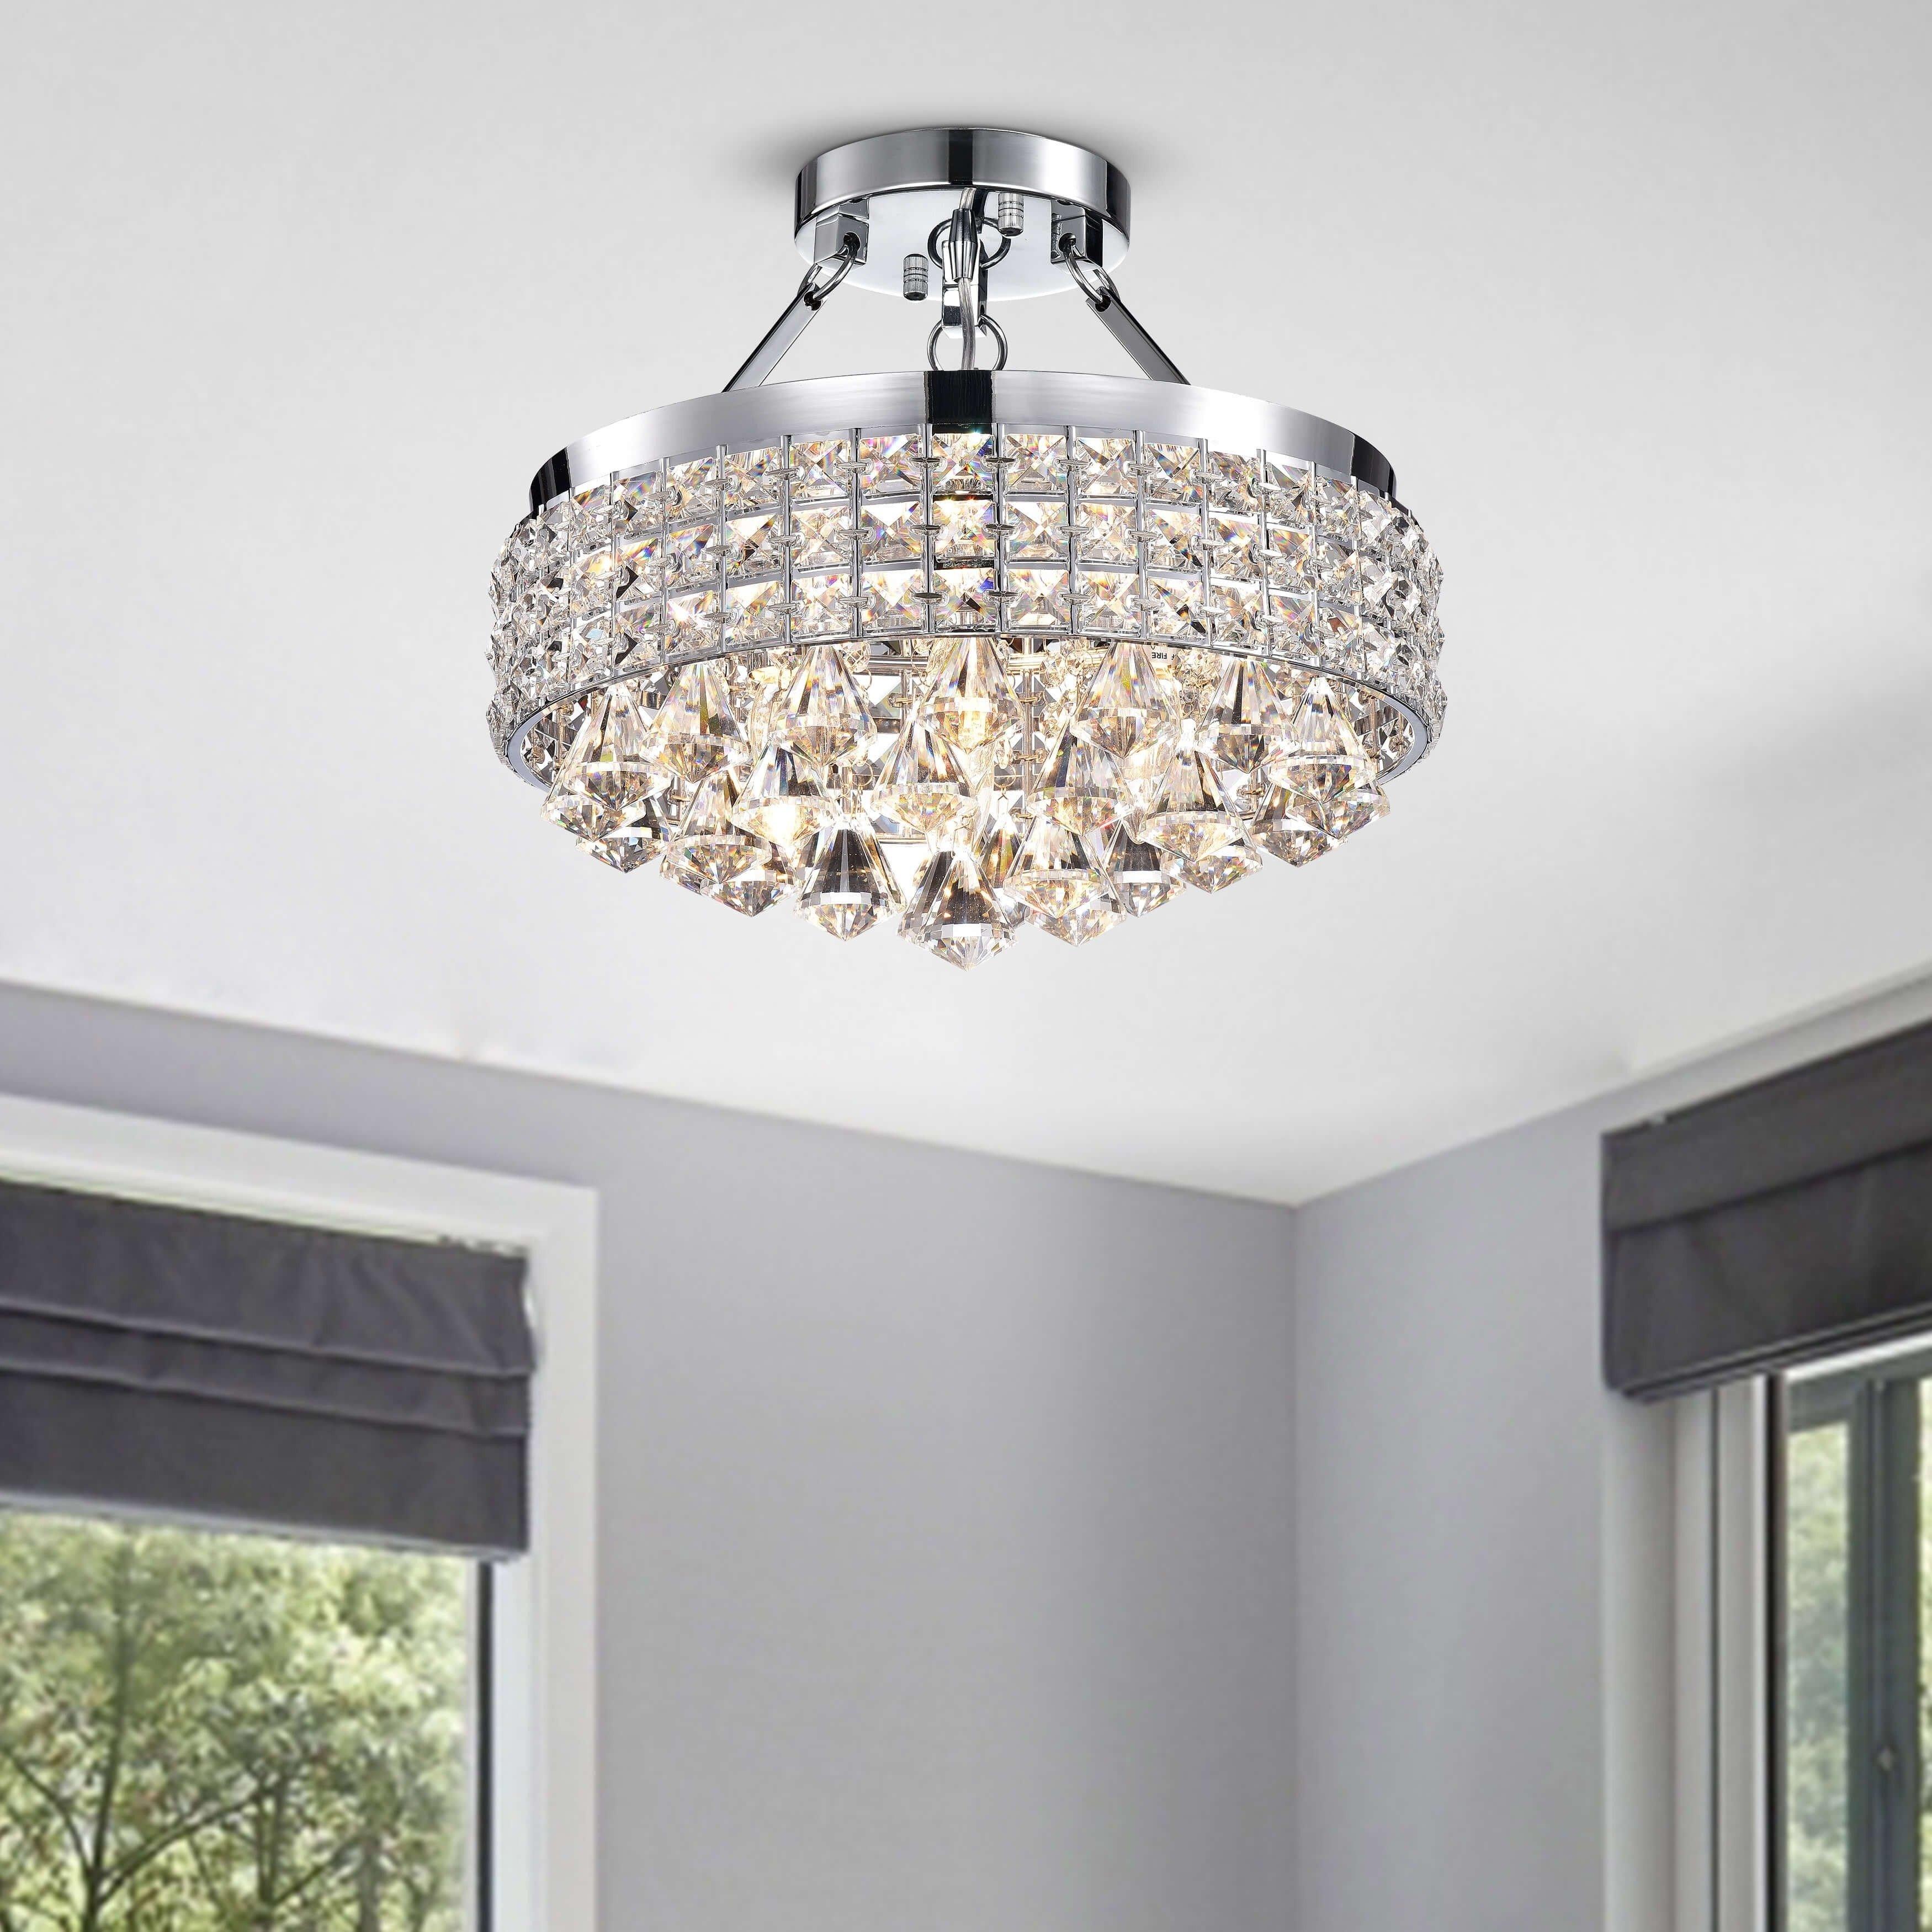 Little Girl Chandelier Bedroom Fresh Antonia 4 Light Crystal Semi Flush Mount Chandelier with Chrome Iron Shade